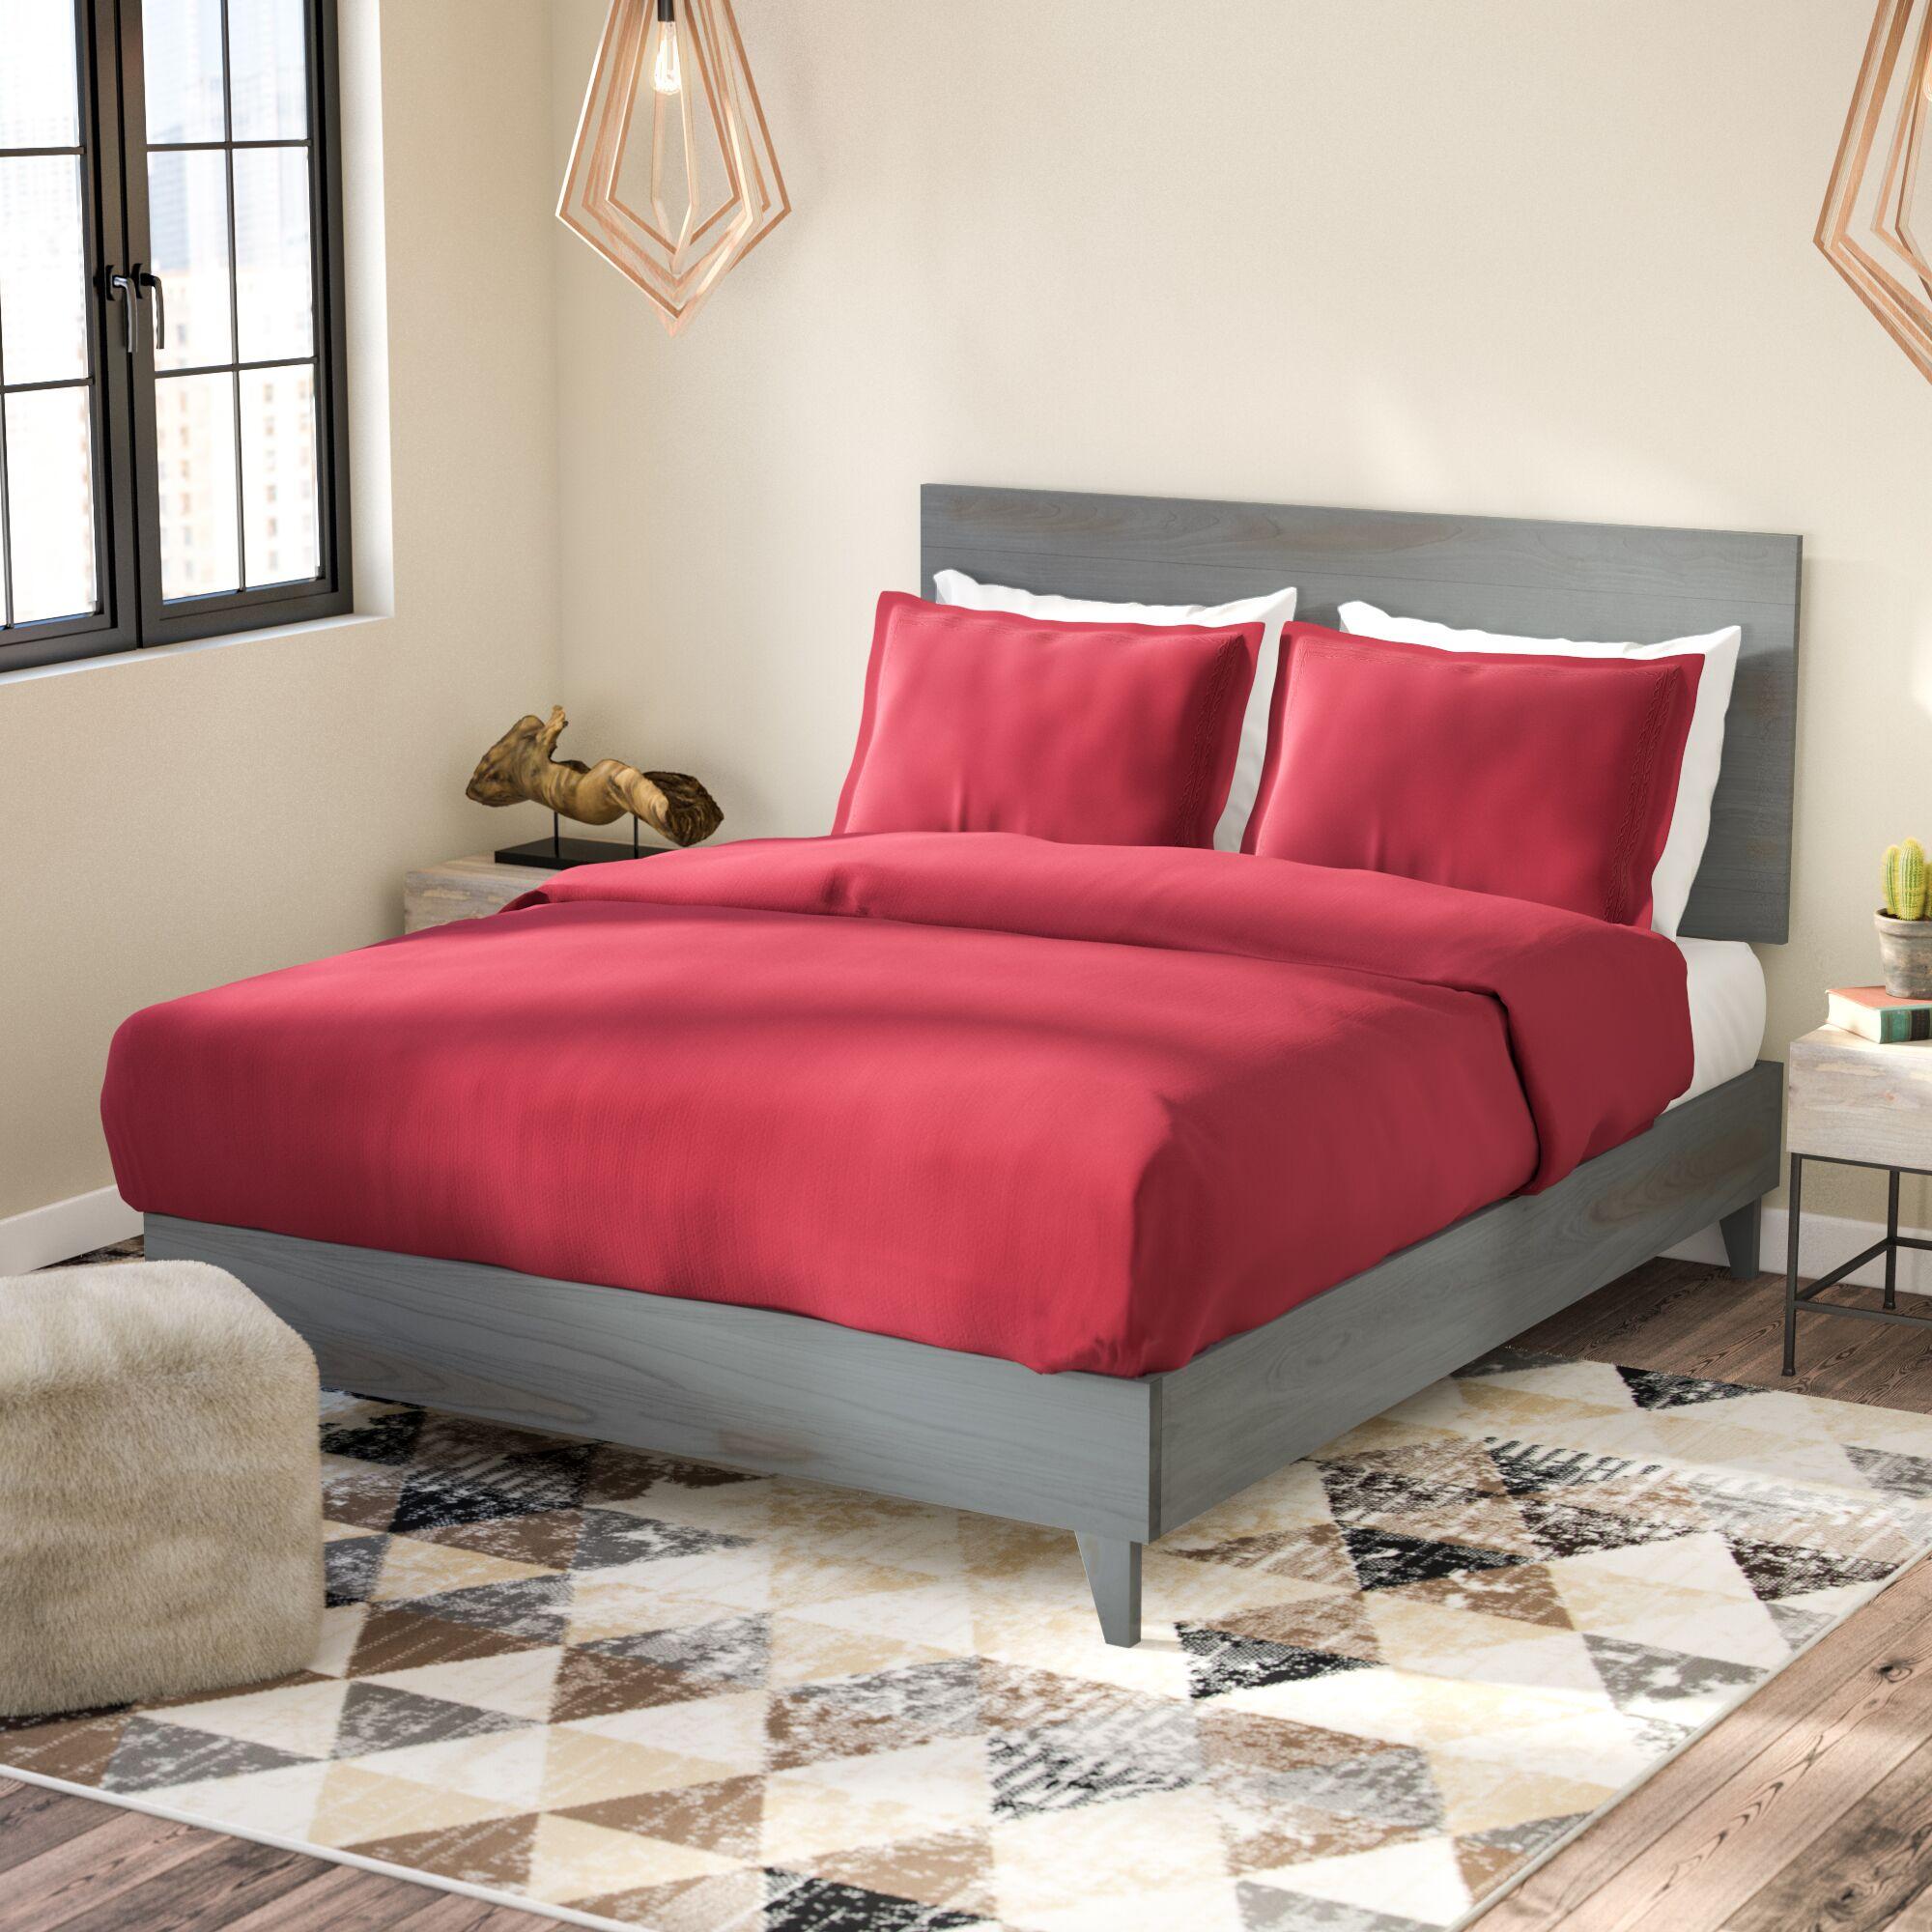 Alayna Industrial Platform Bed Size: Full